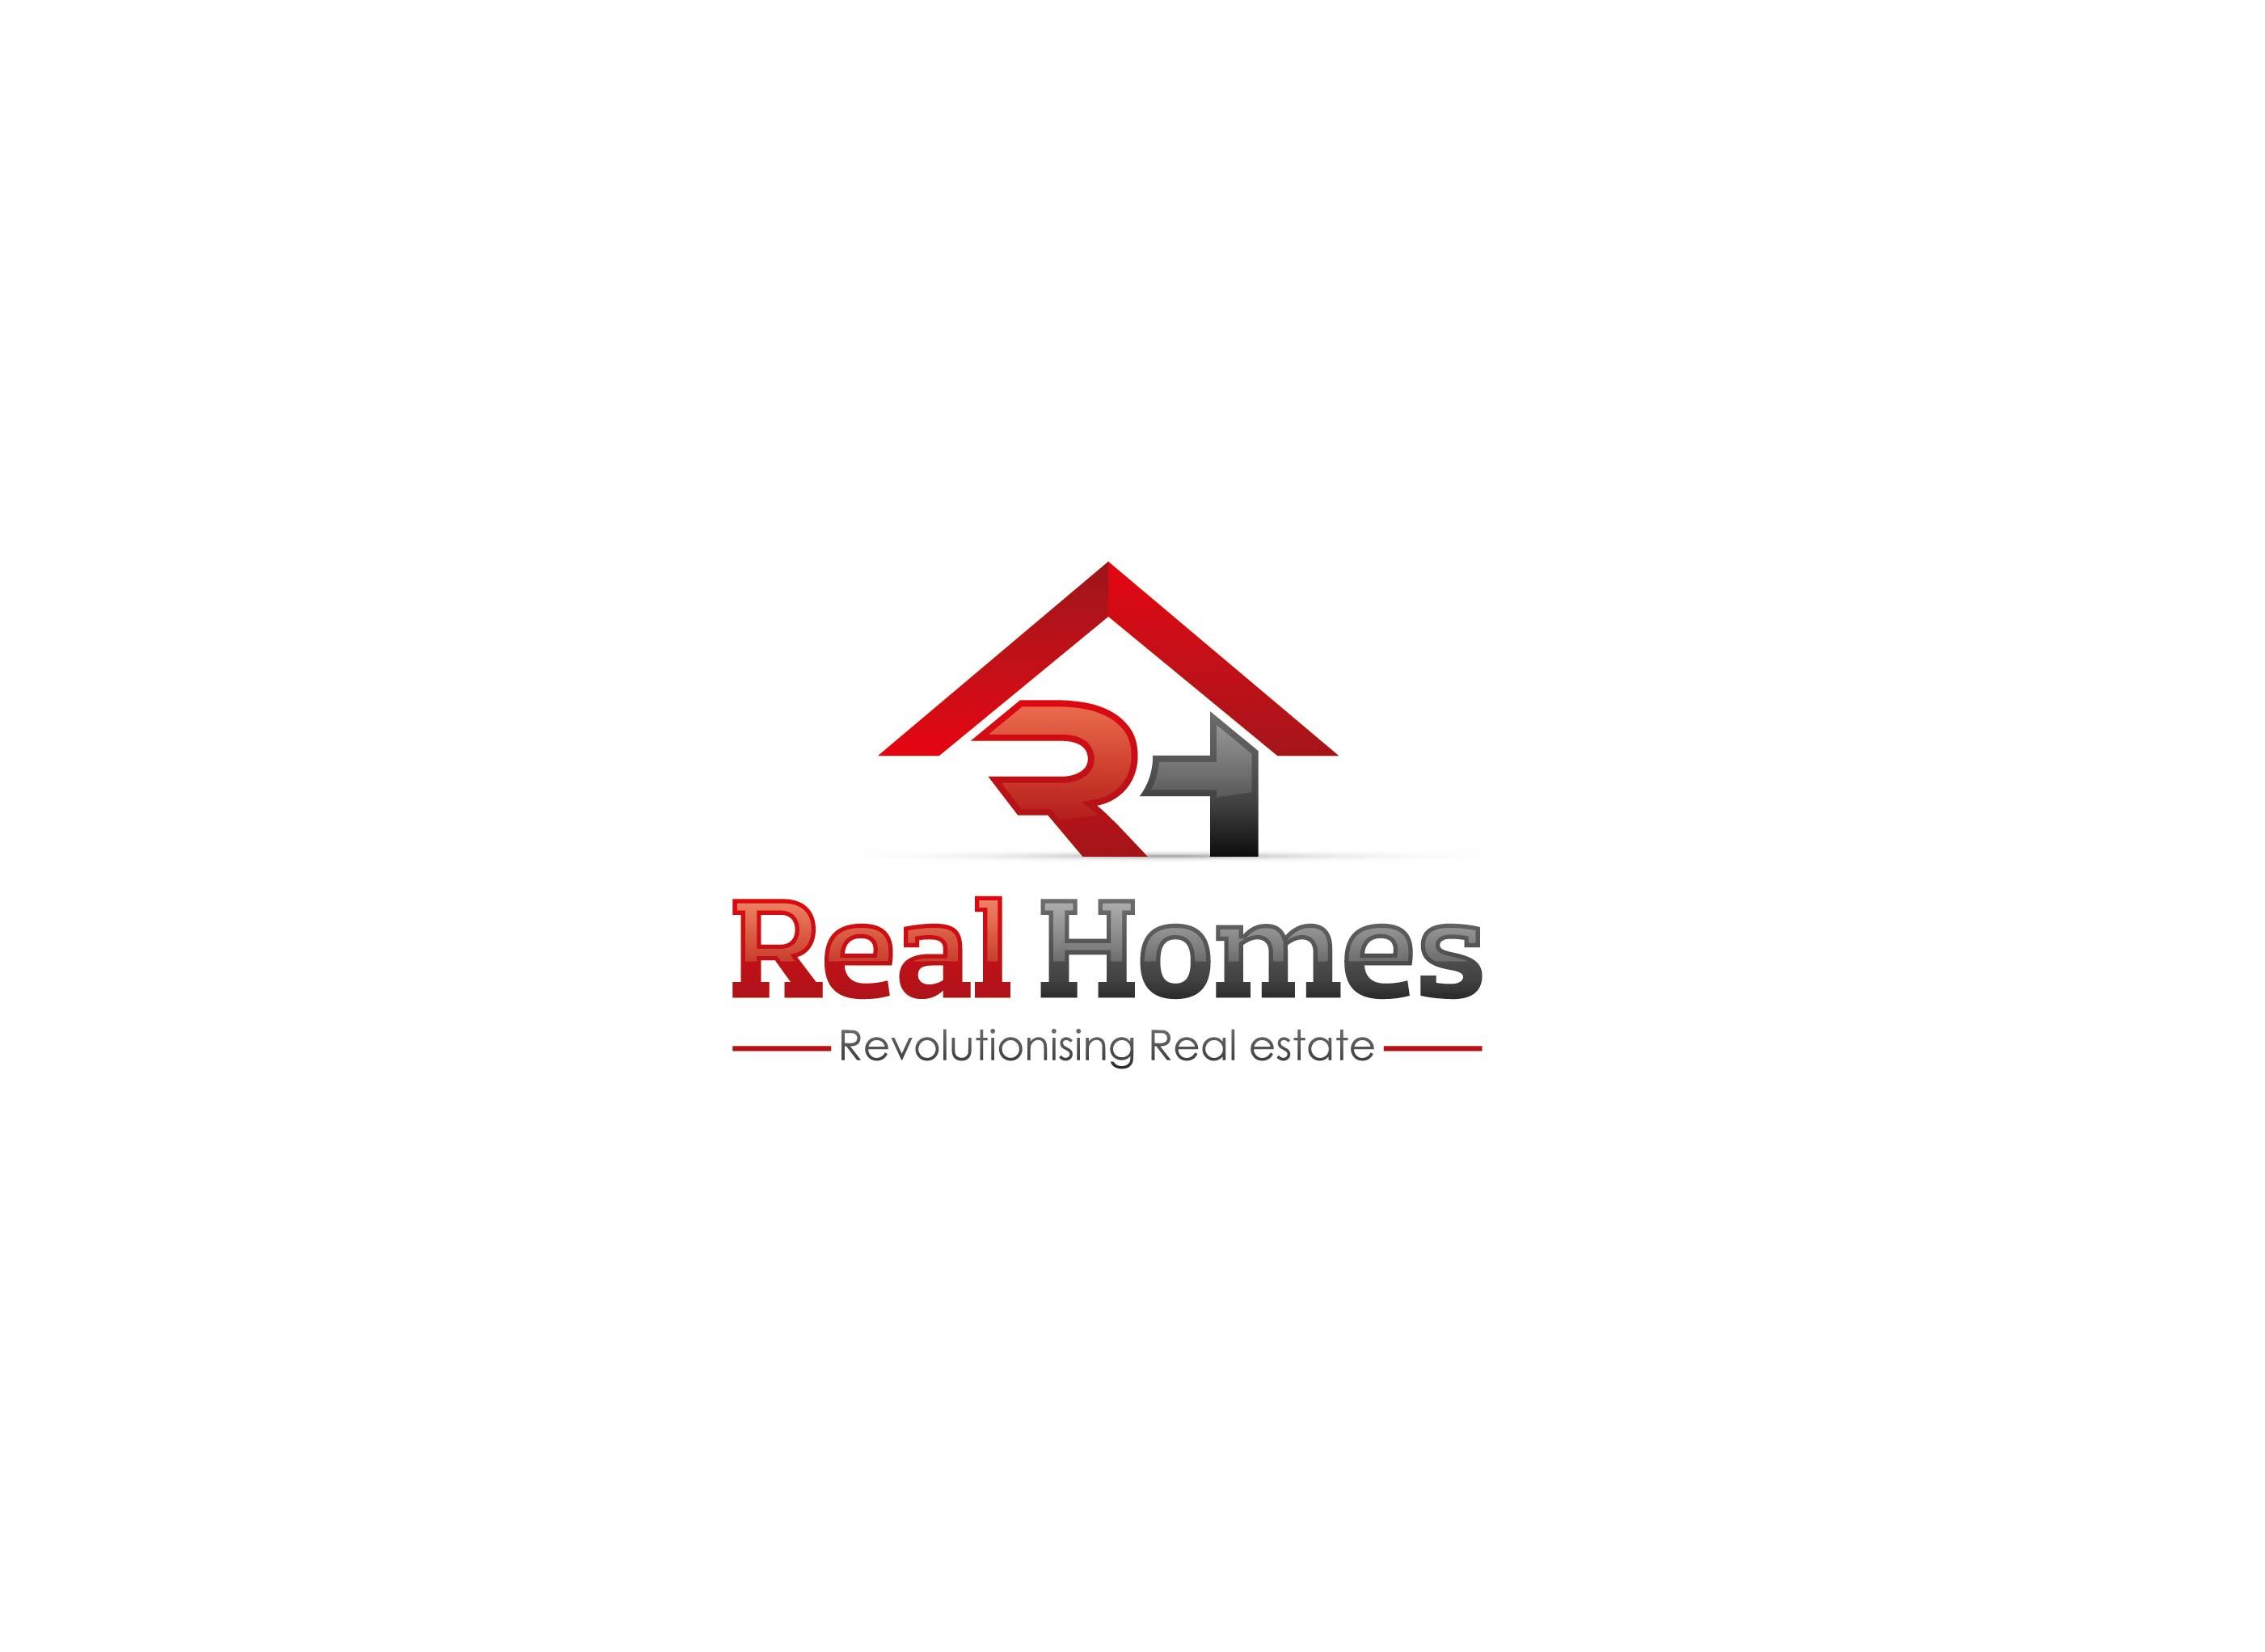 Logo Design by Adnan Taqi - Entry No. 85 in the Logo Design Contest Captivating Logo Design for Real Homes.